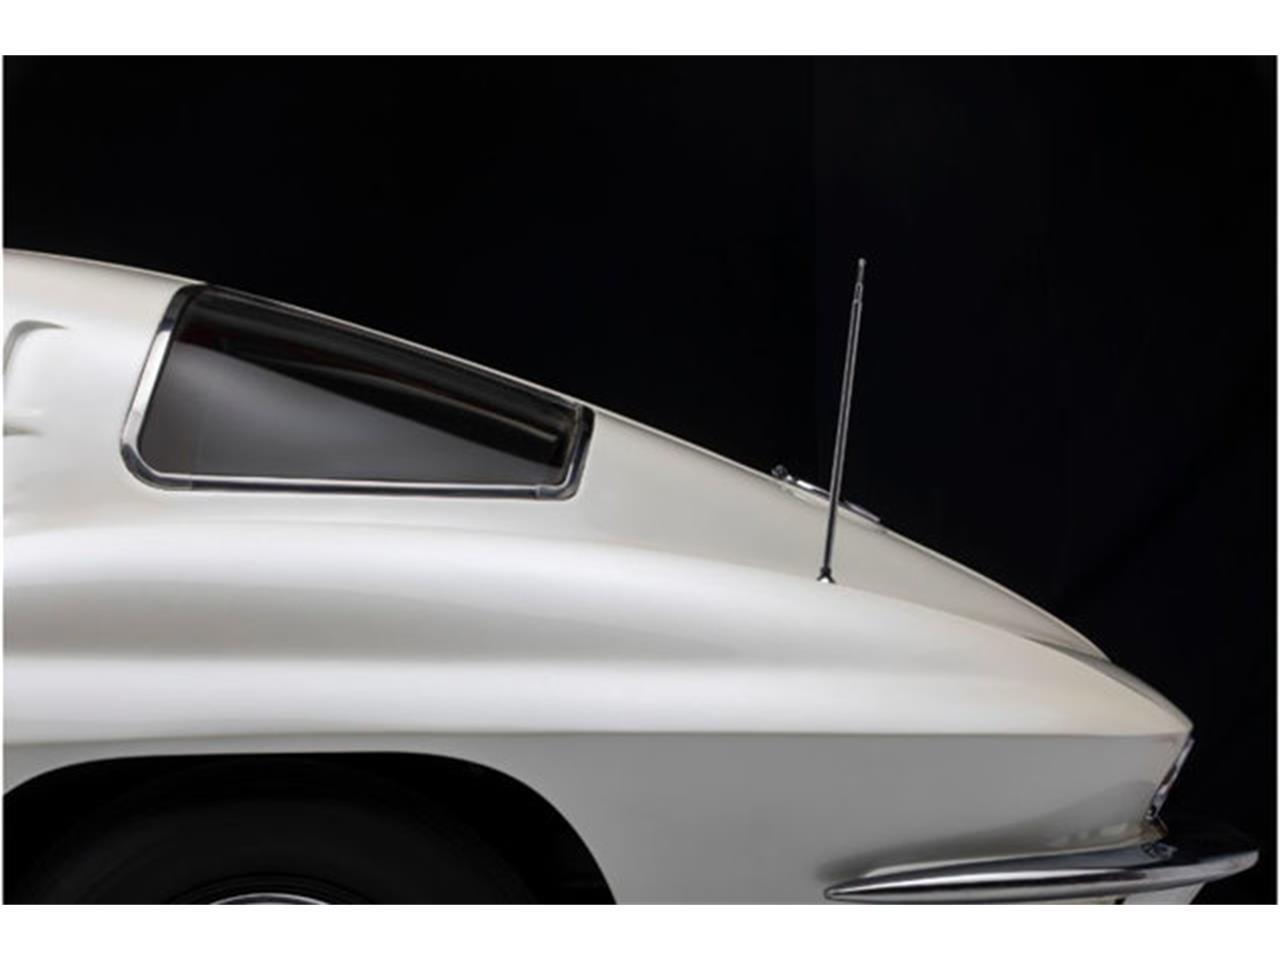 Large Picture of '63 Corvette located in New York - QOXV